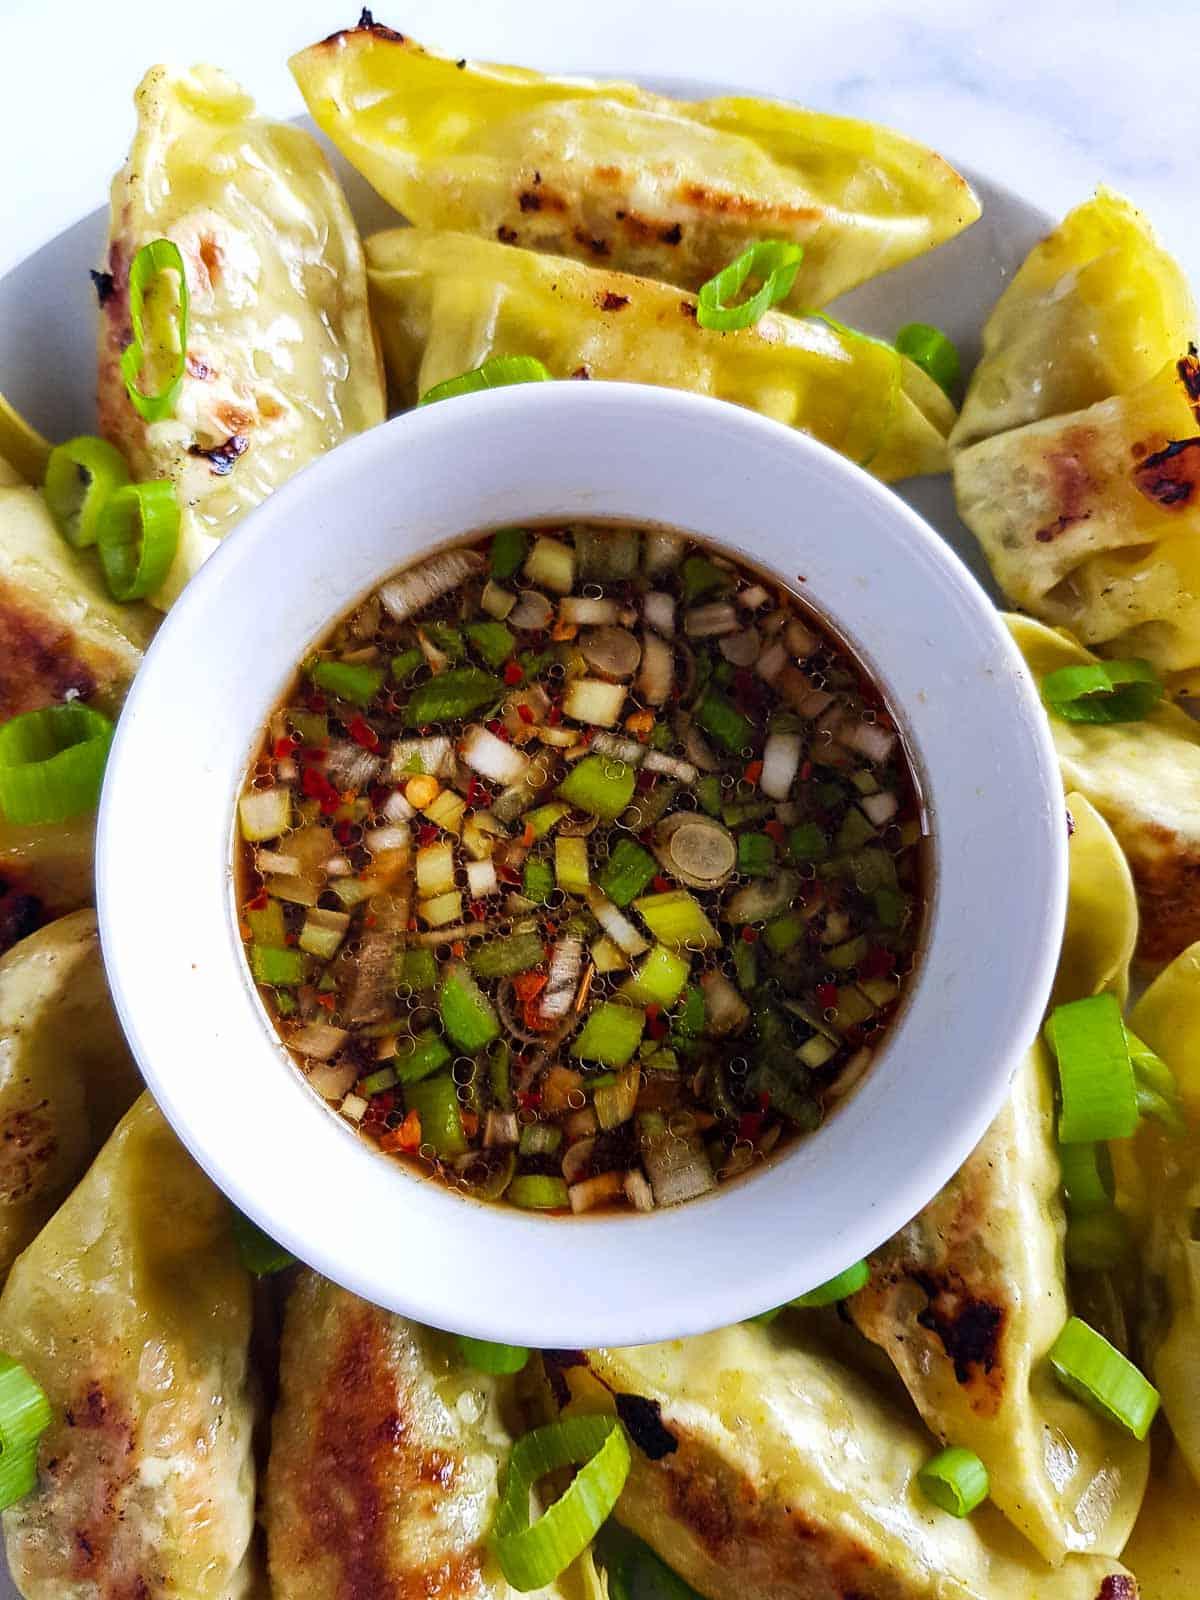 Gyoza sauce on a plate surrounded by gyozas.